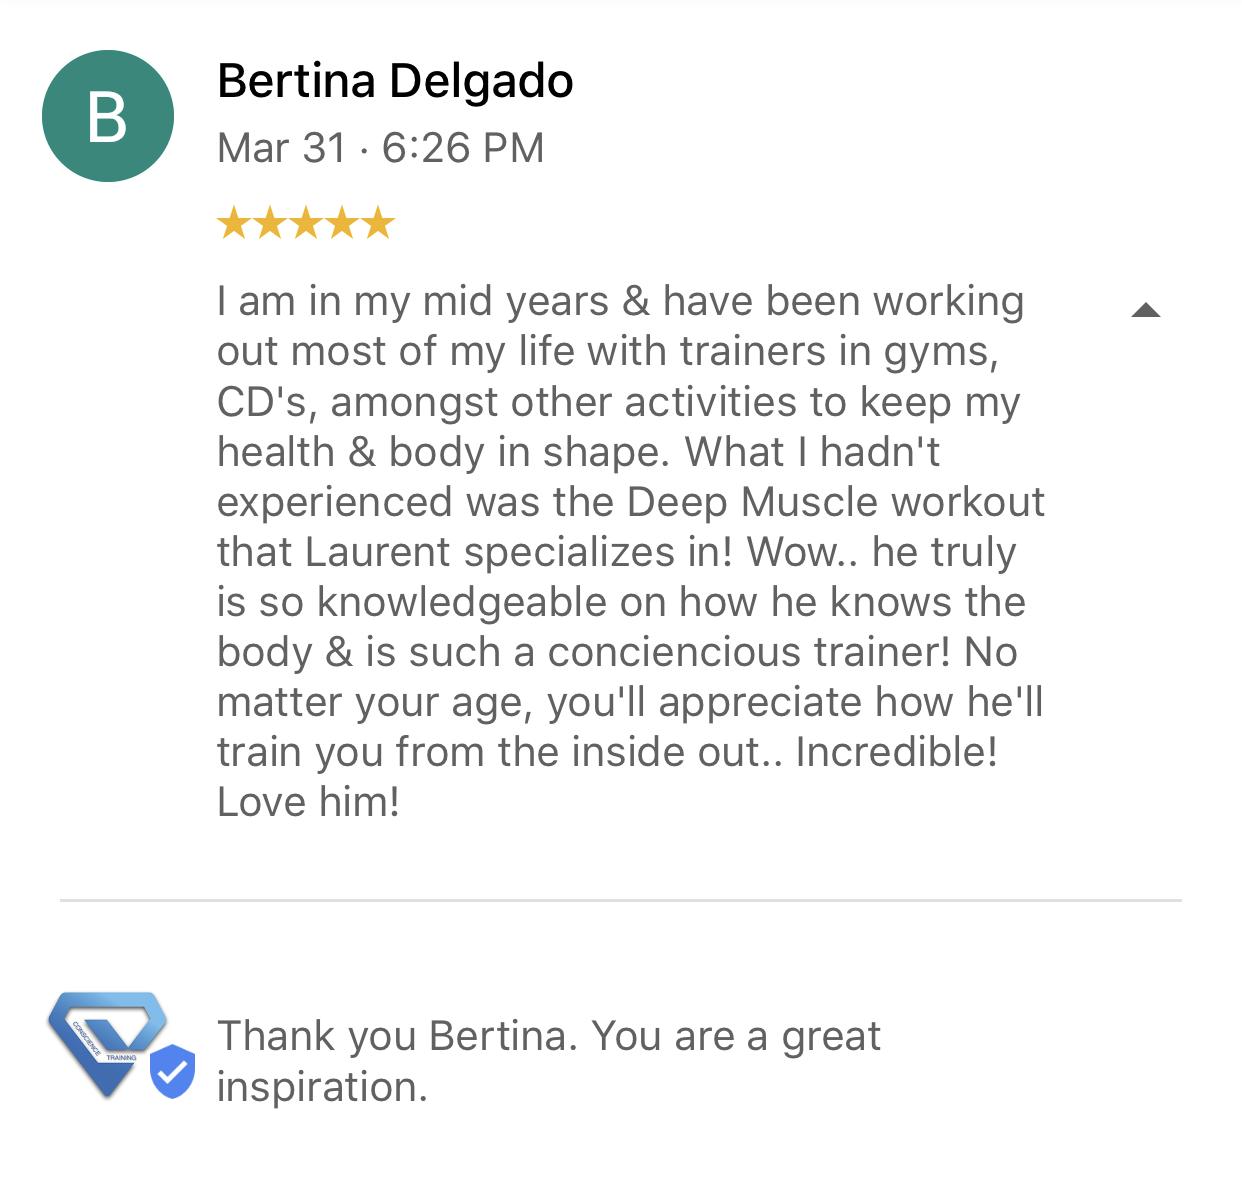 Bertina Delgado